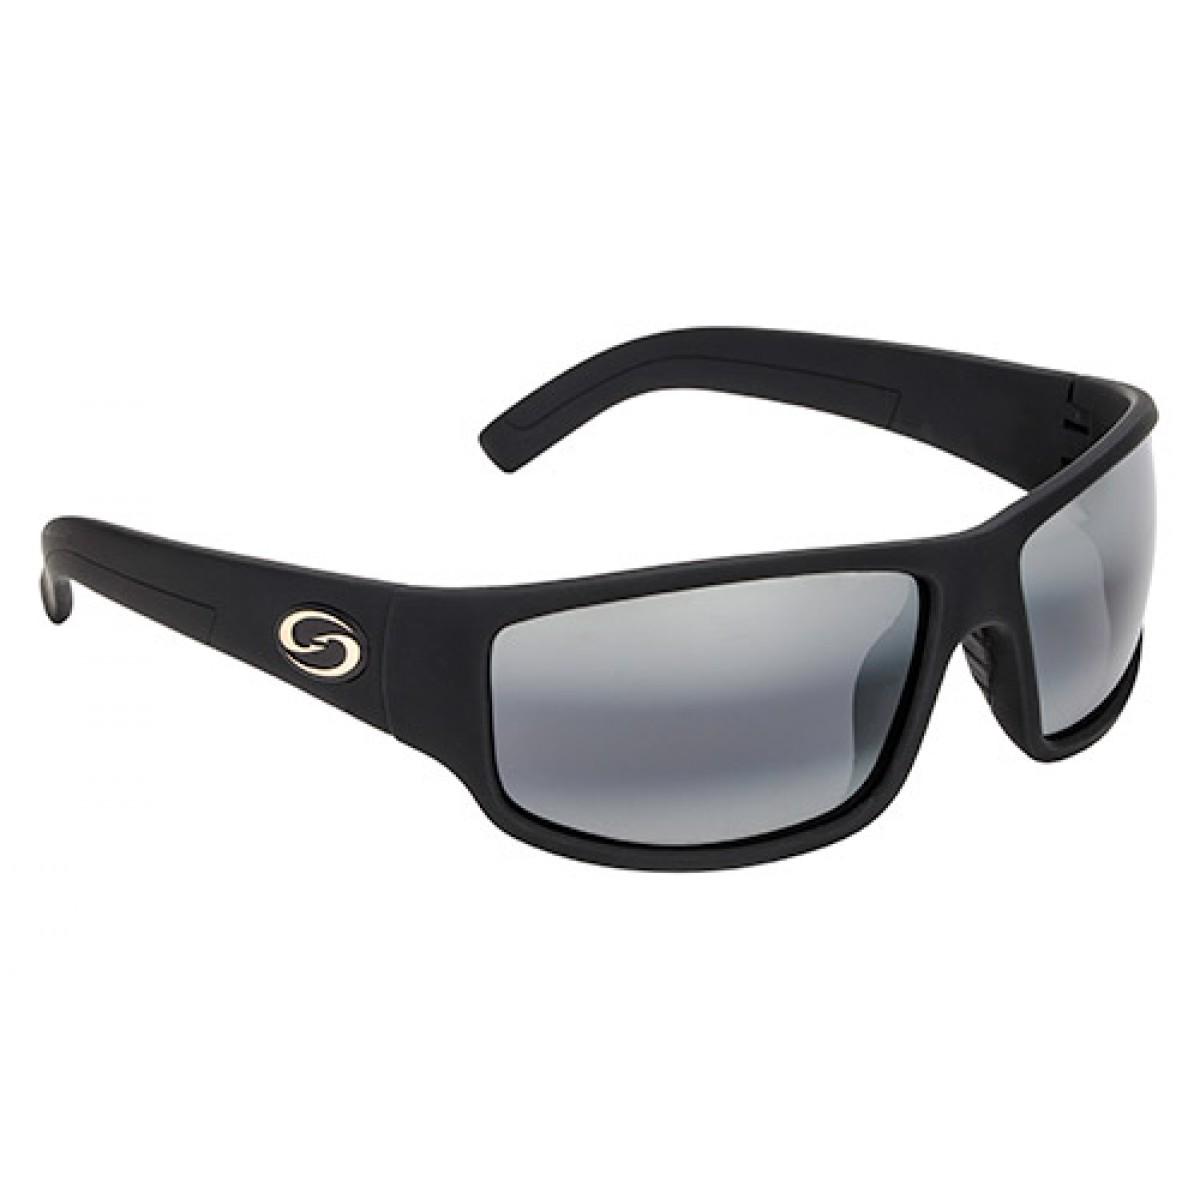 191f43d5d8 Strike King S11 Sunglasses